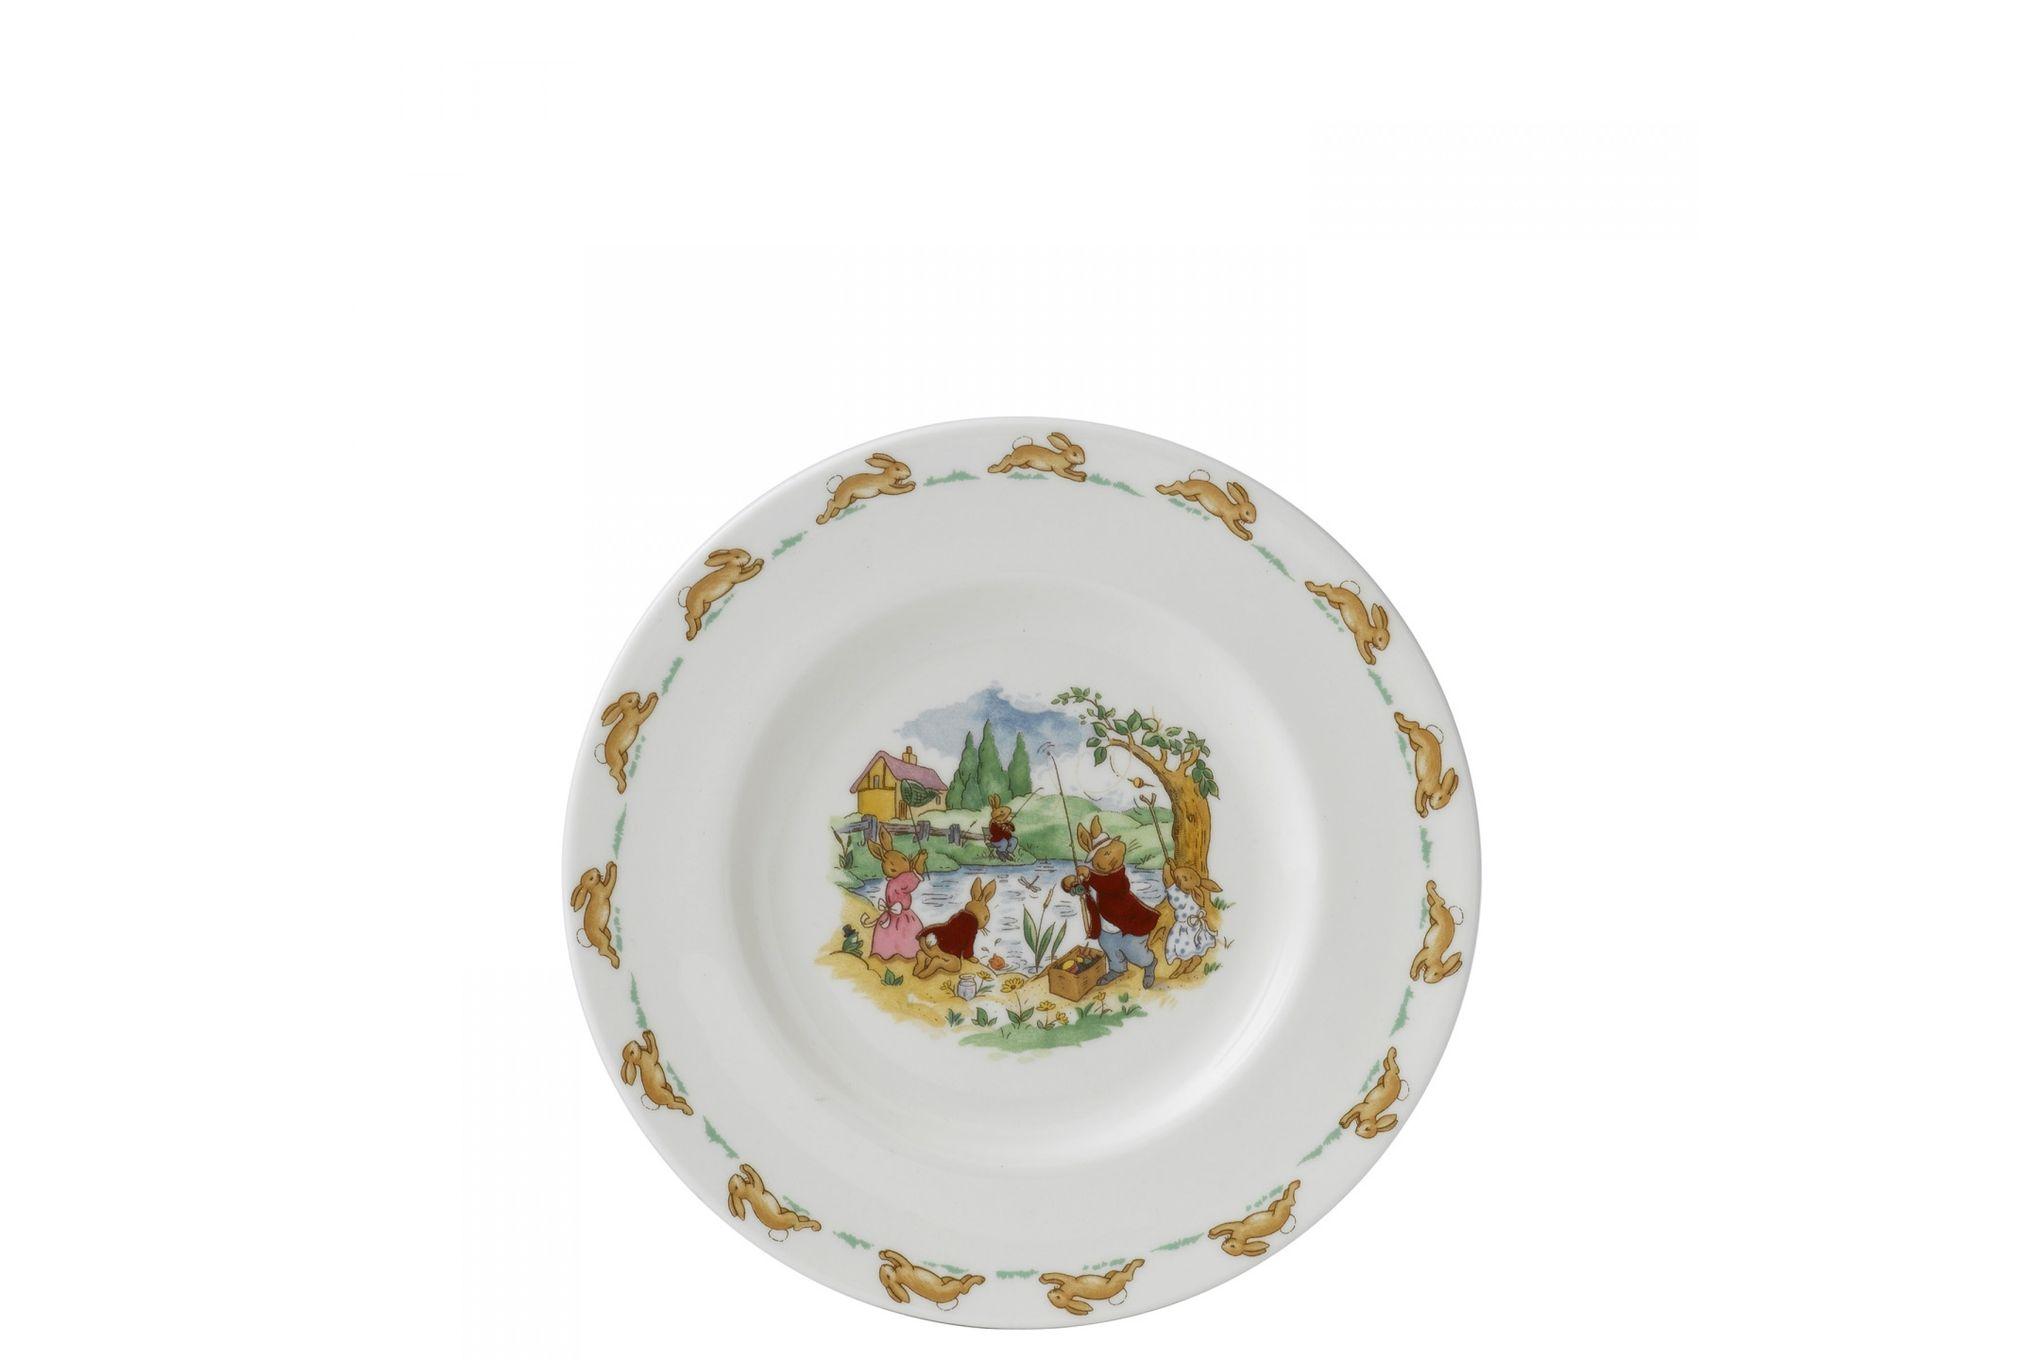 Royal Doulton Bunnykins Side Plate Designs Vary 20cm thumb 1